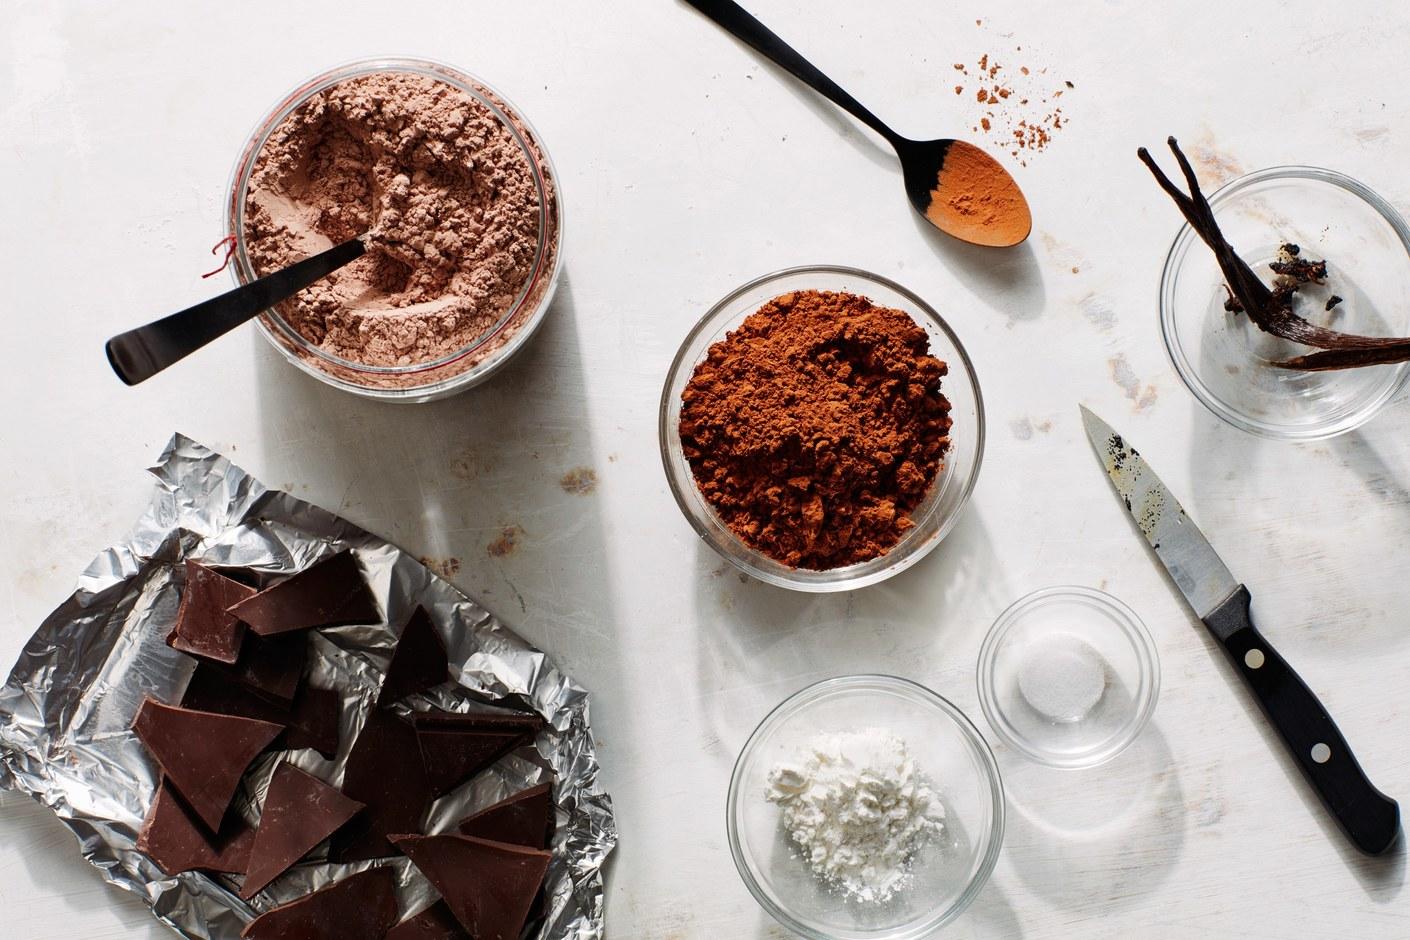 Hot chocolate 5 different ways